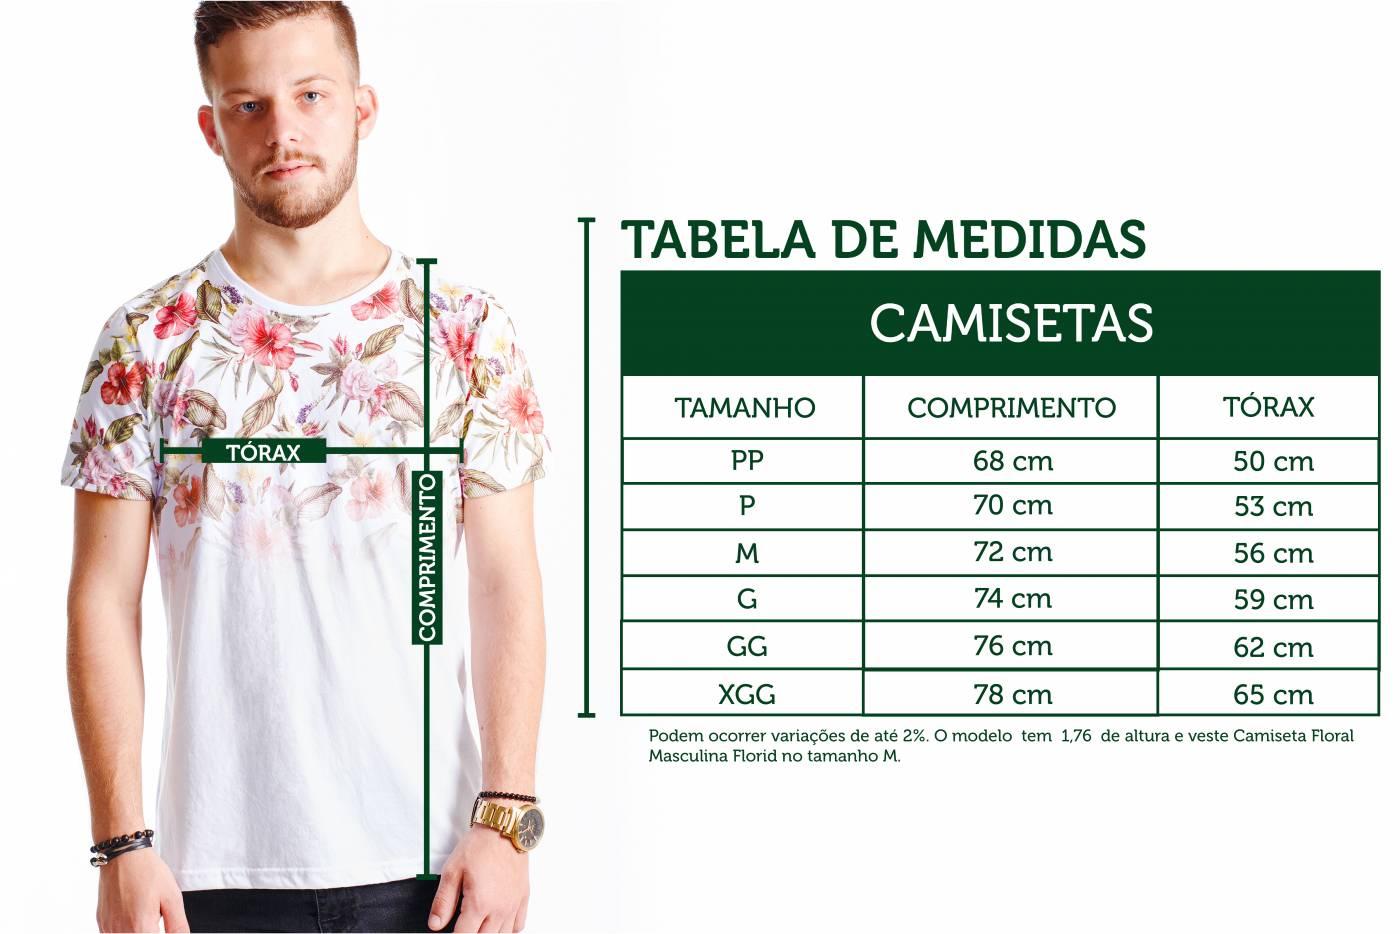 tabela-de-medidas-das-camisetas-estampadas-masculina